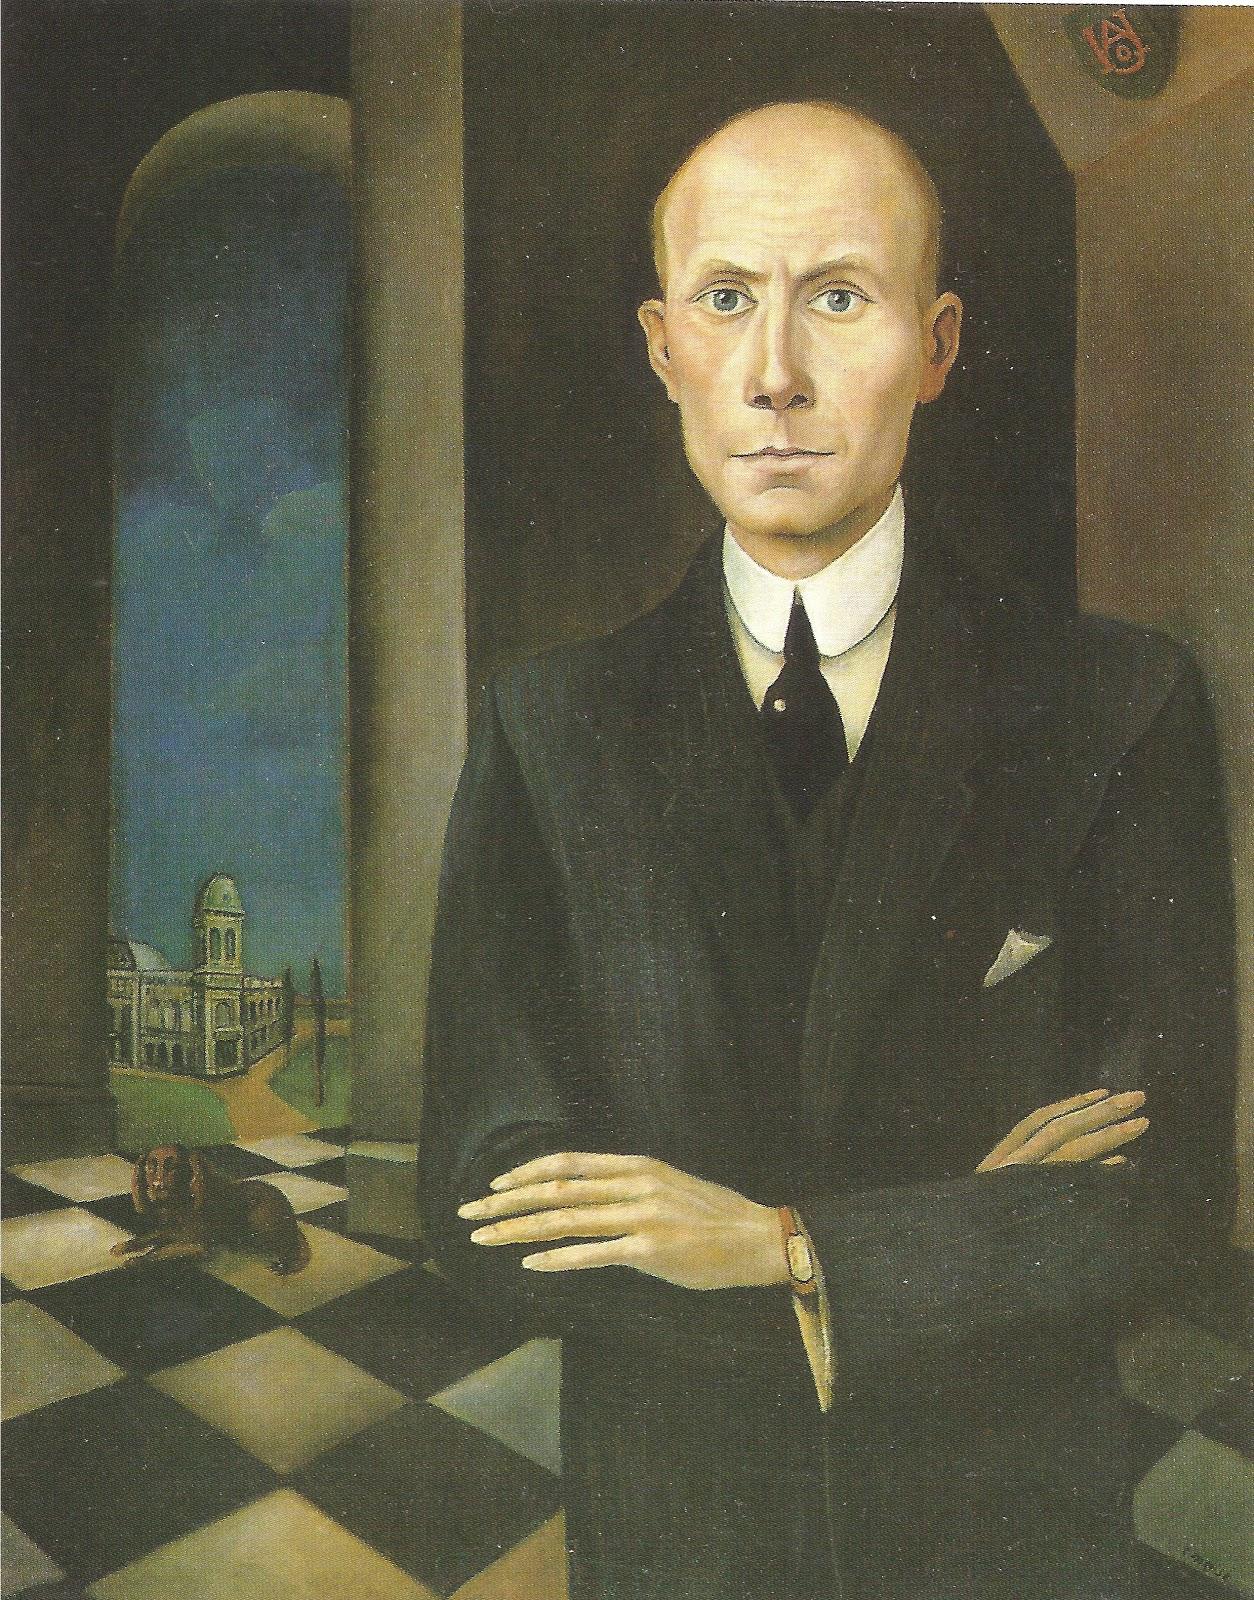 Carlos mense portrait of underberg (1922)